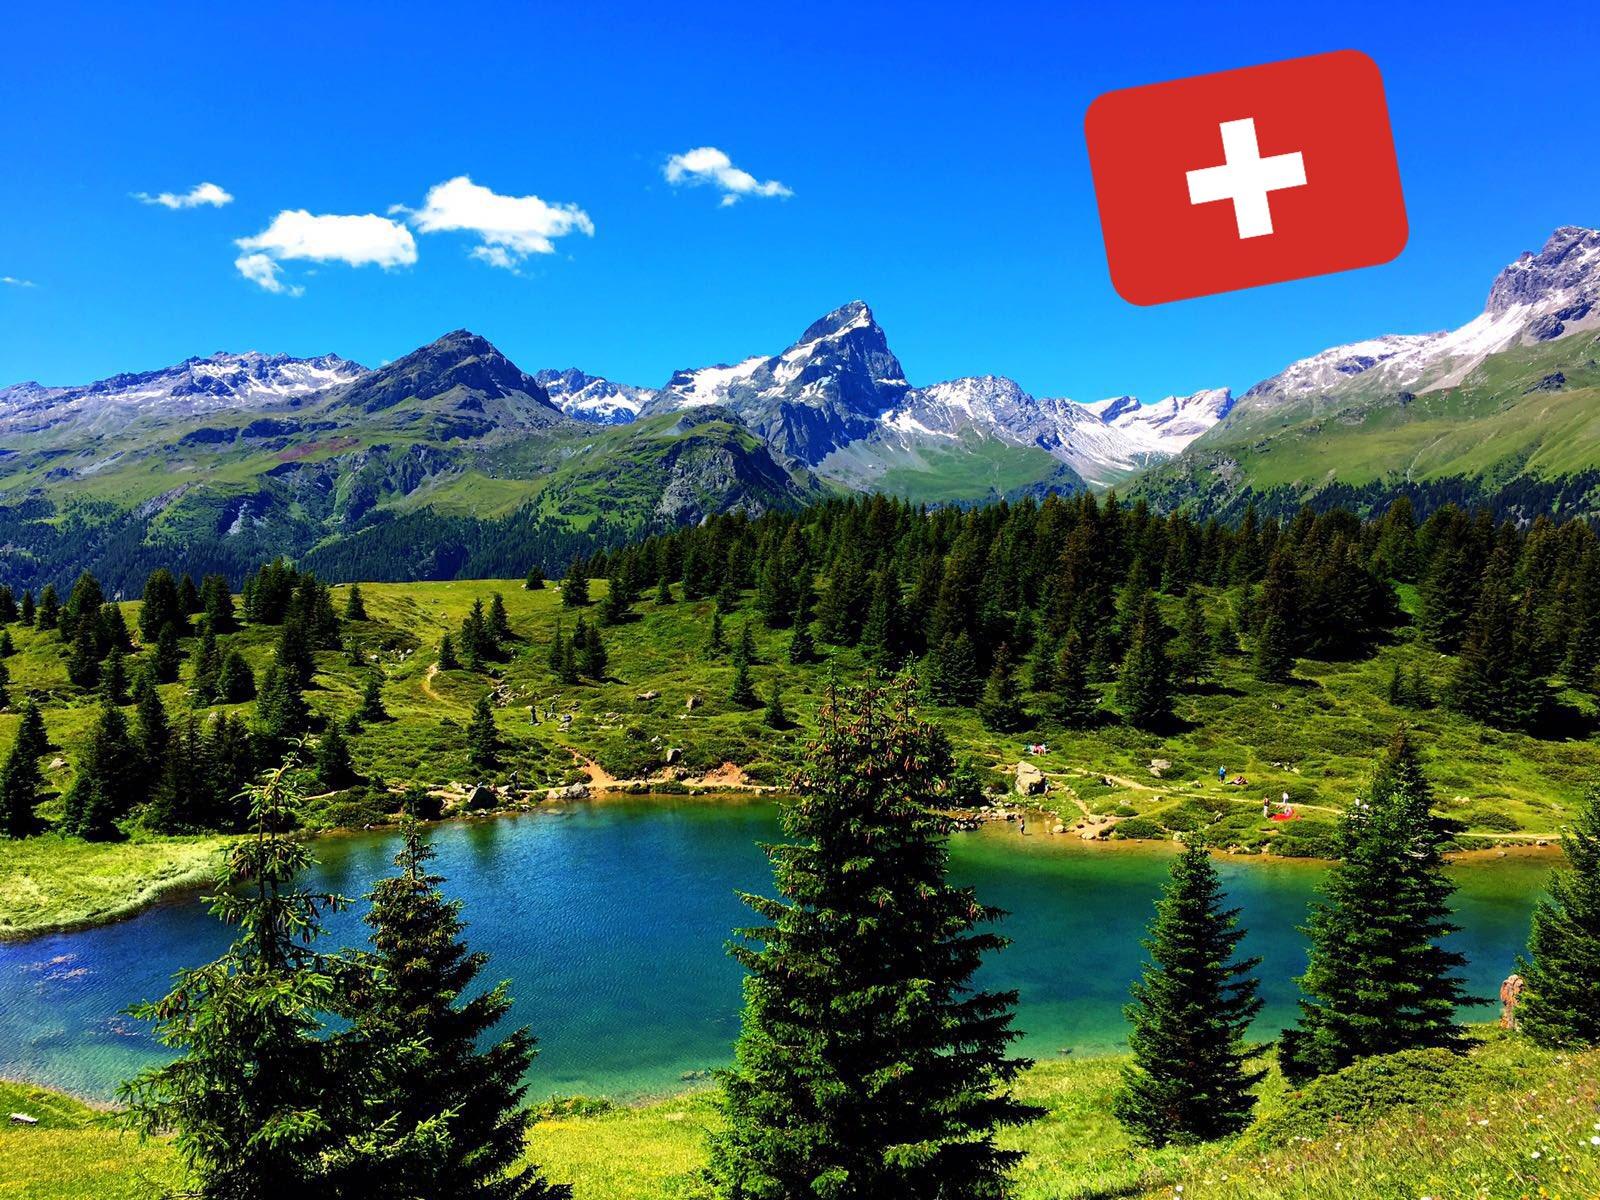 Happy #SwissNationalDay ❤���� https://t.co/uS6ZydXDpP